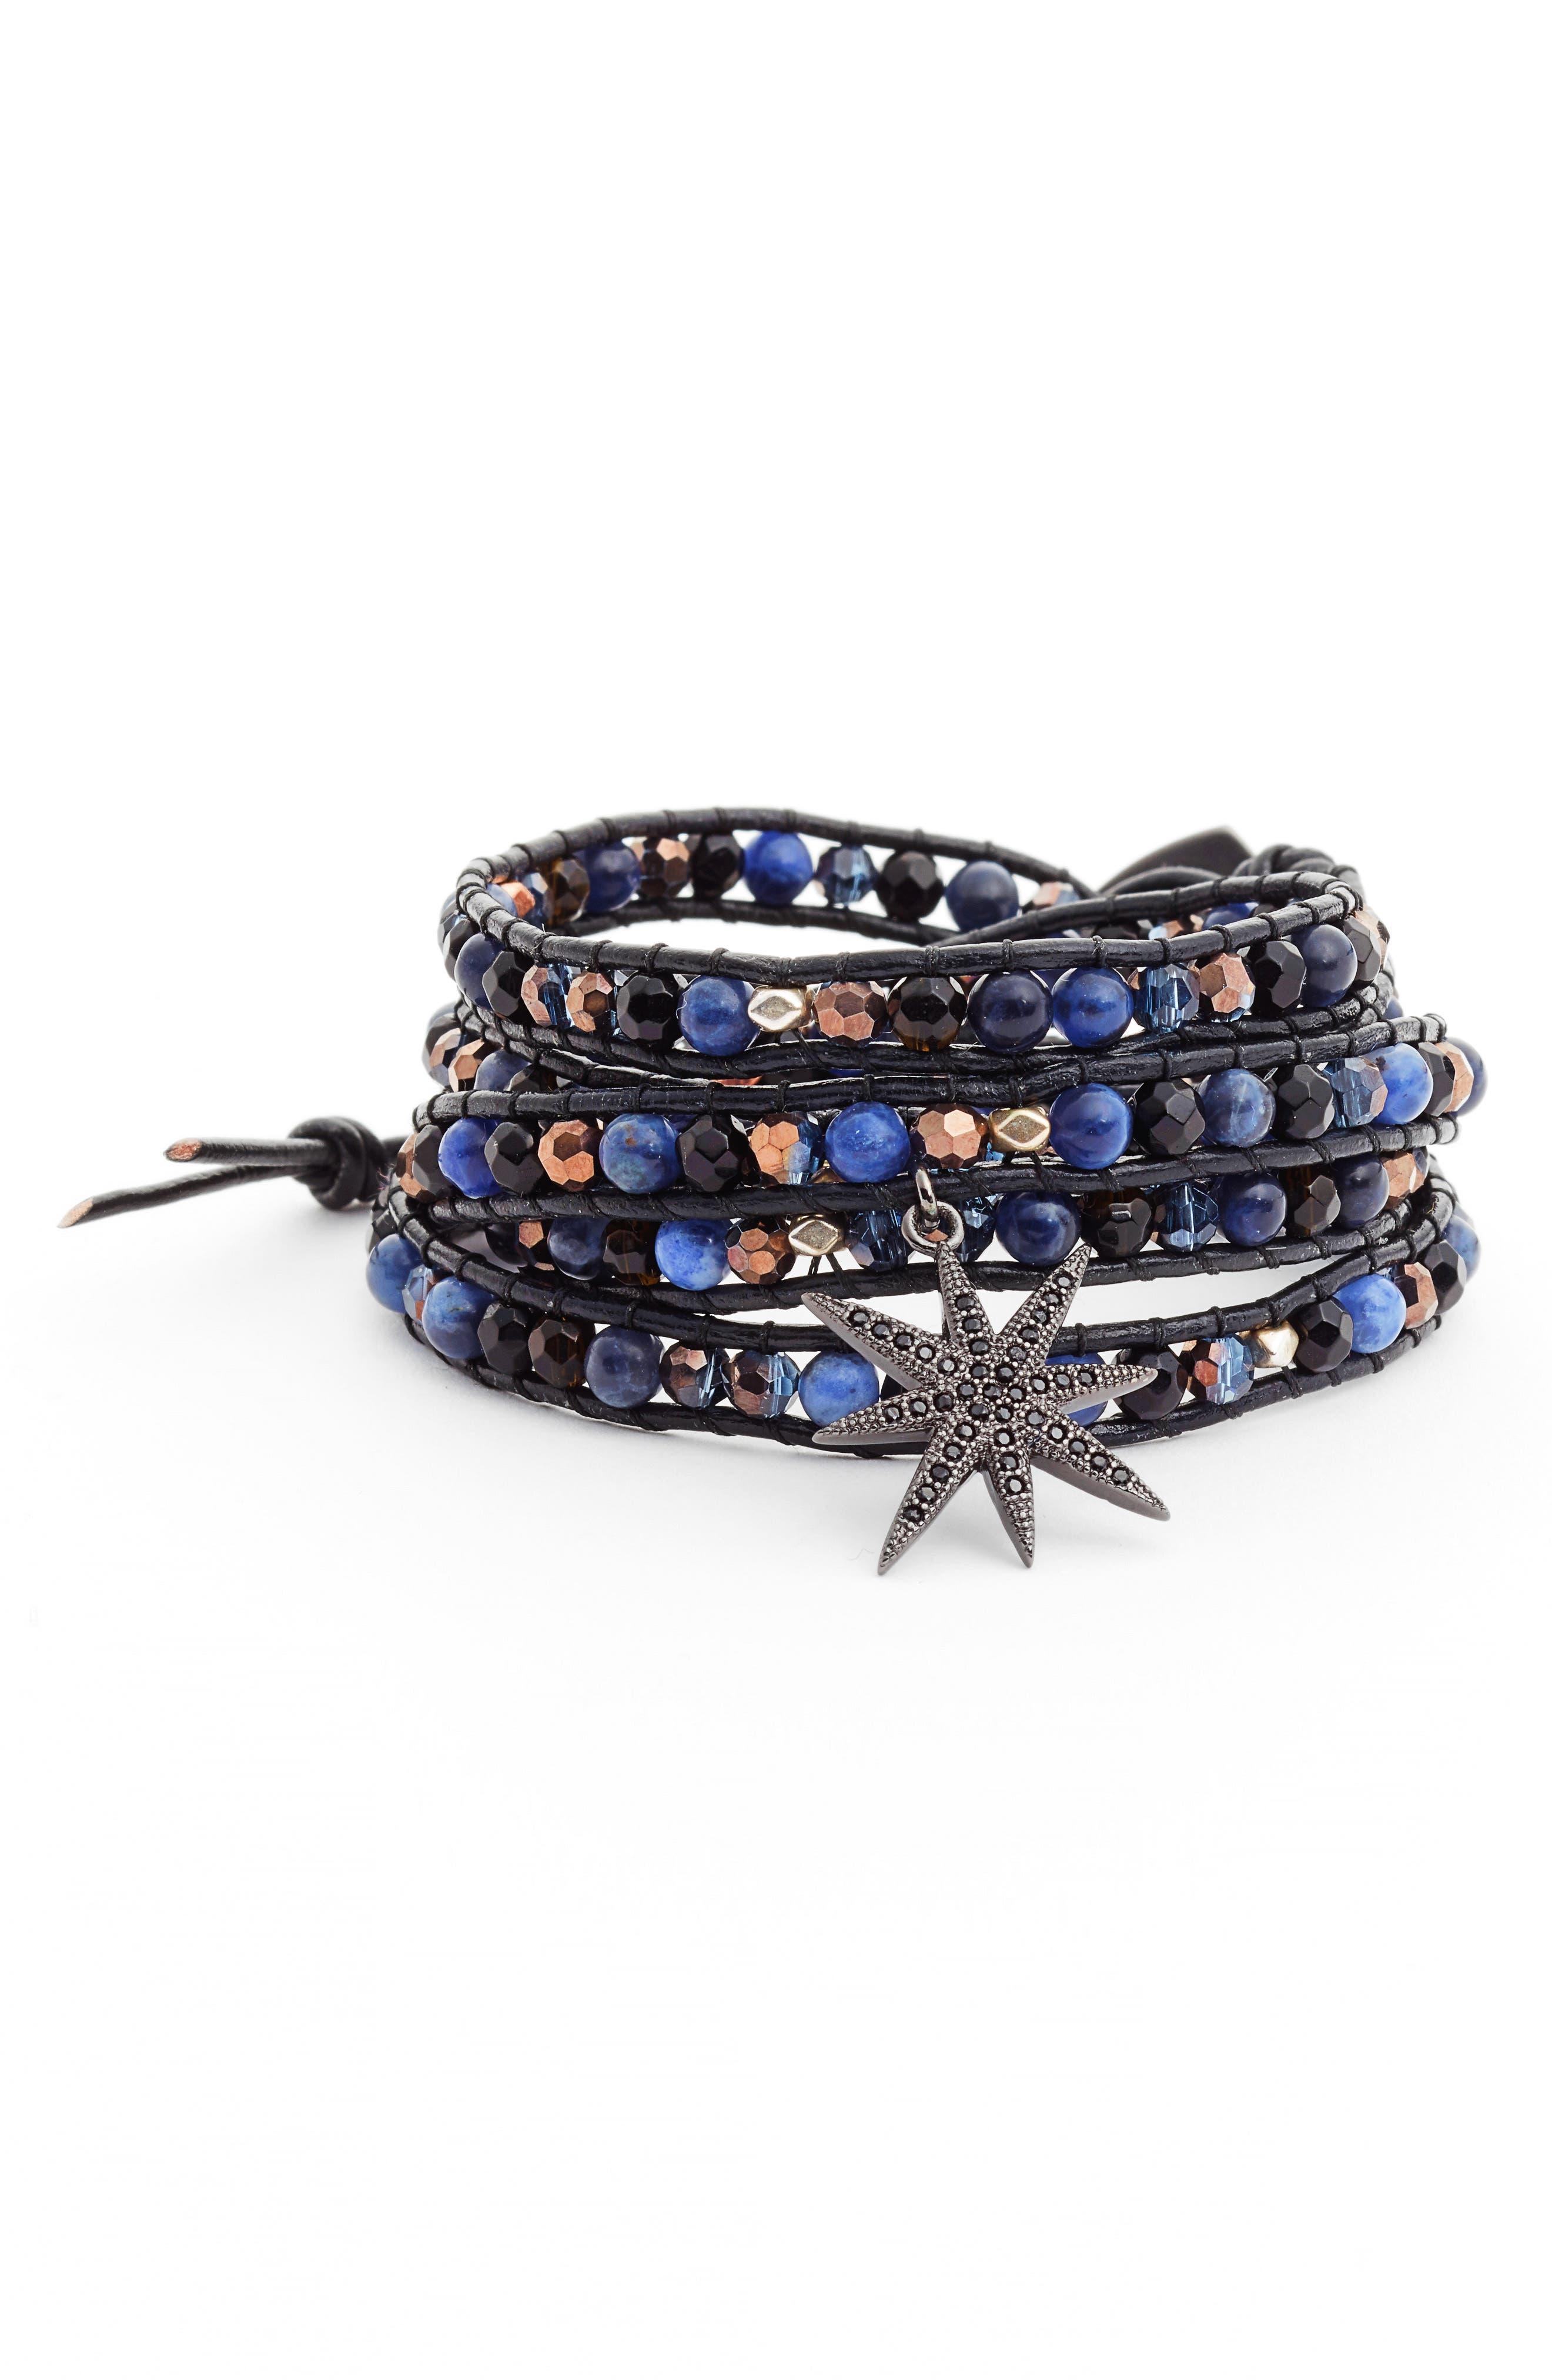 Main Image - Nakamol Design Crystal Charm Wrap Bracelet